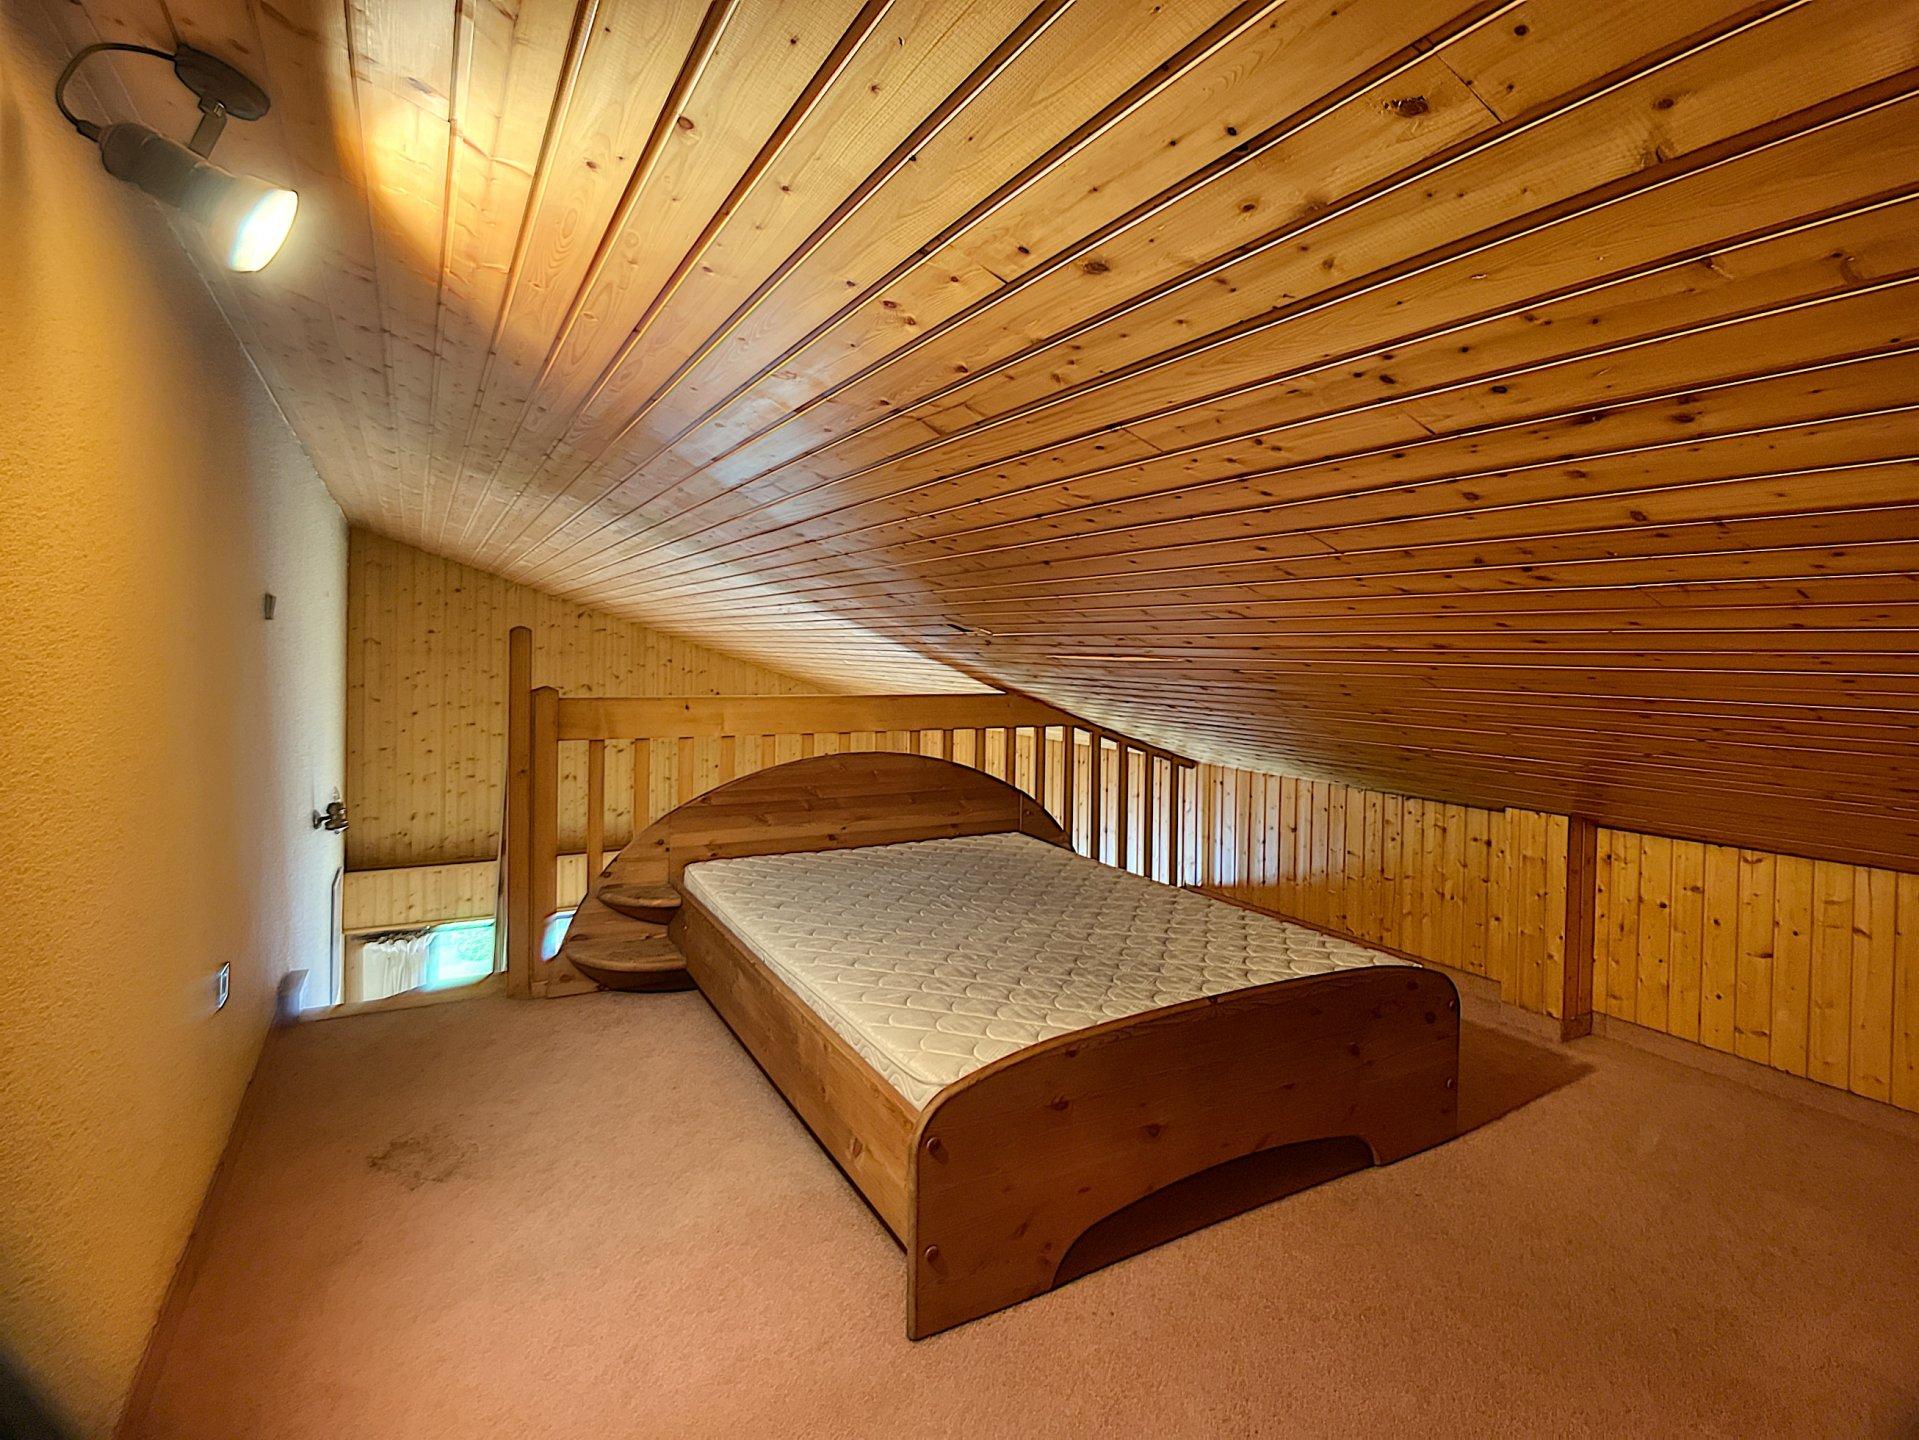 Appartement 2 chambres, Chamonix Mont-Blanc